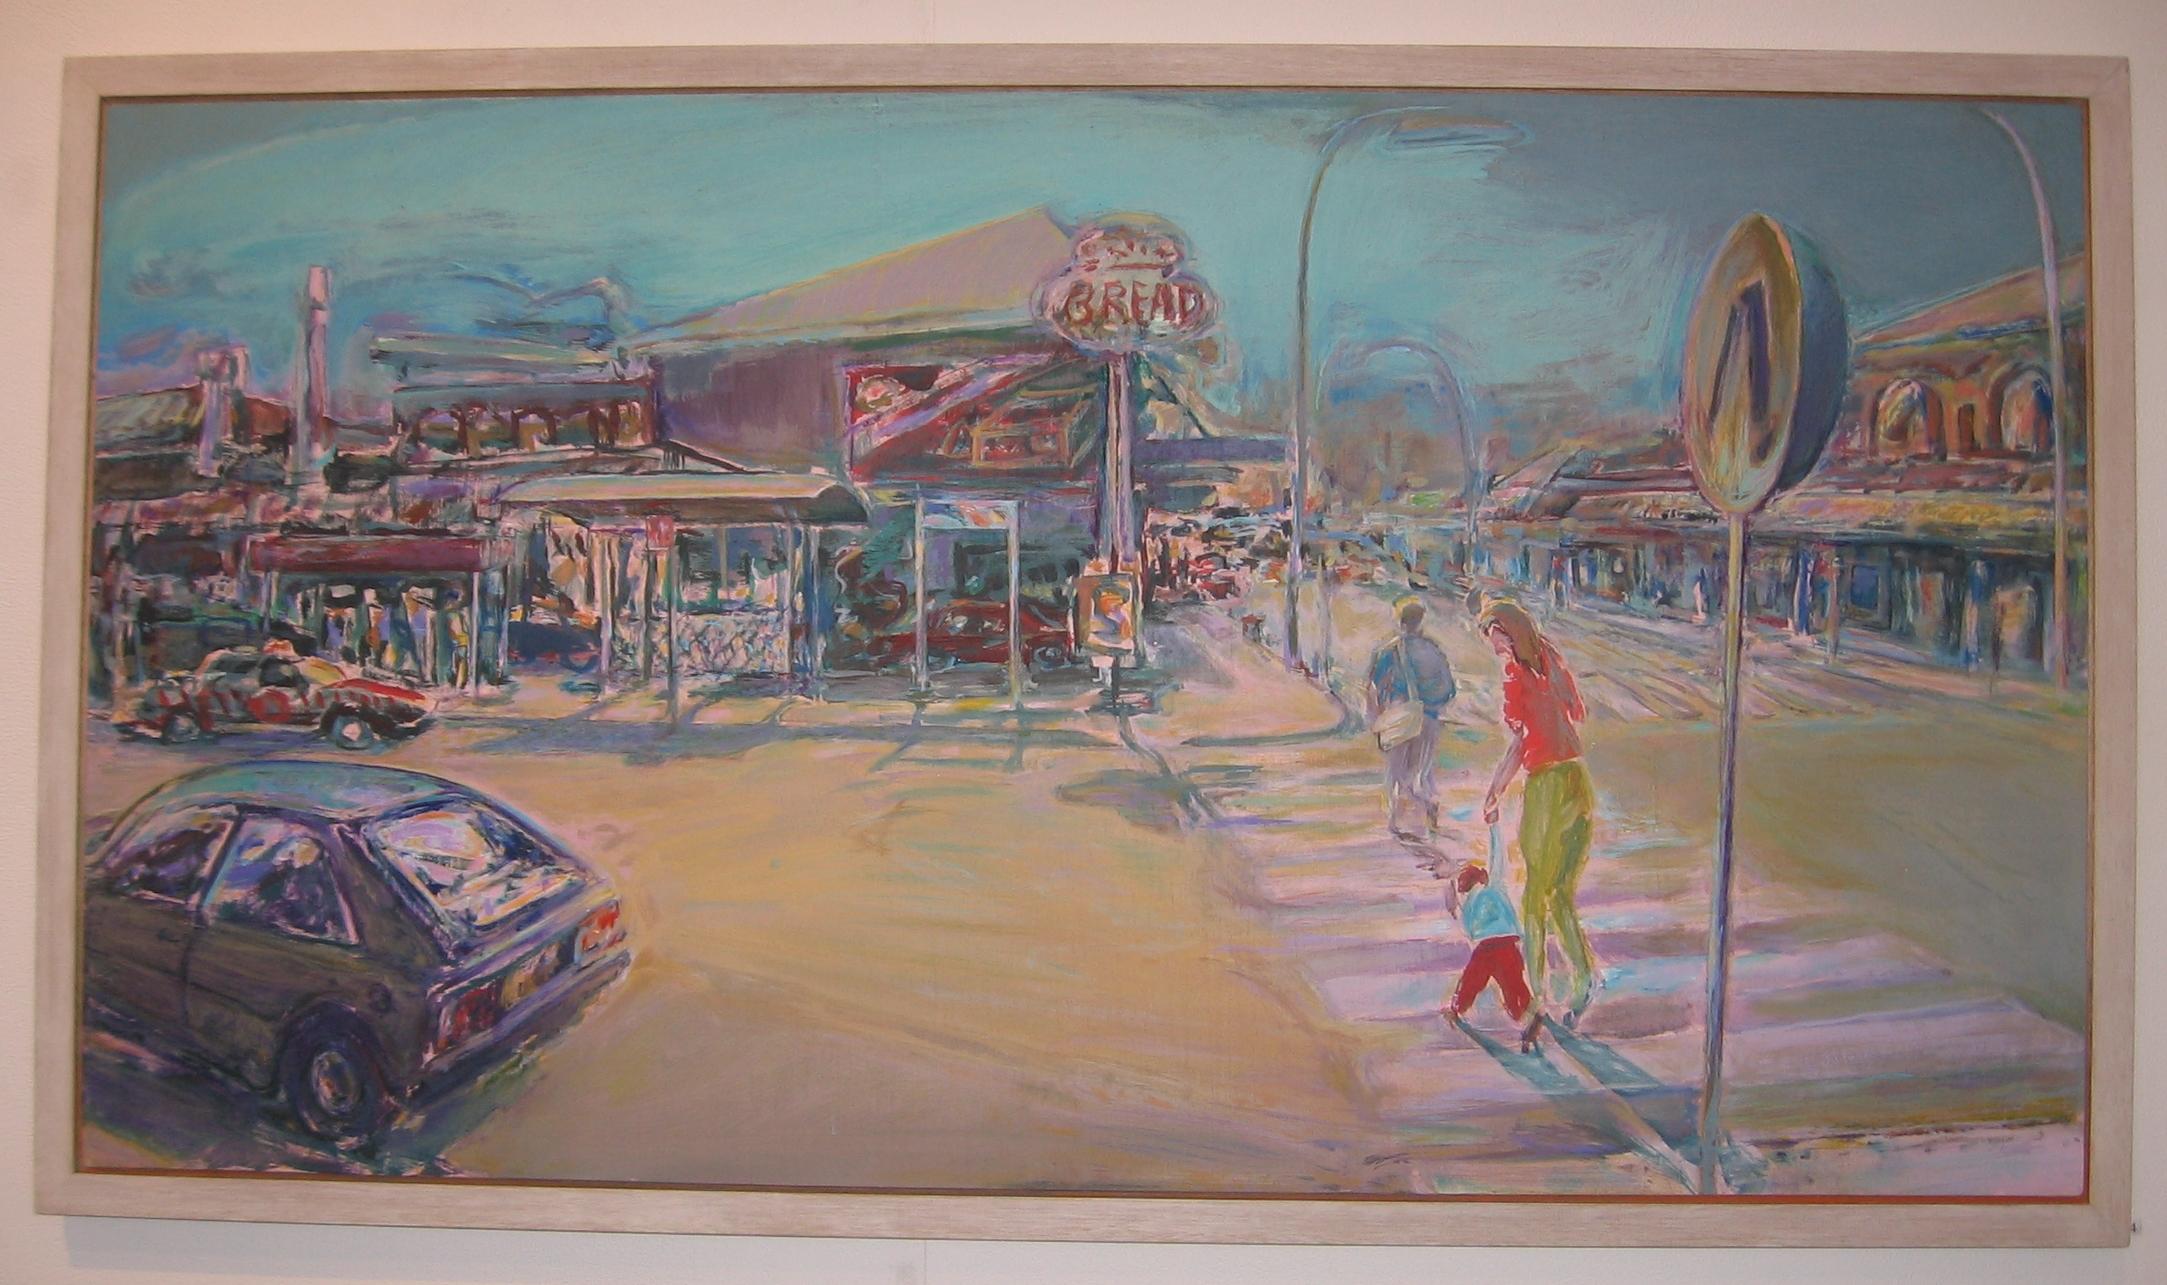 Crossing, 1992-93, acrylic on plywood, 66 x 122 cm